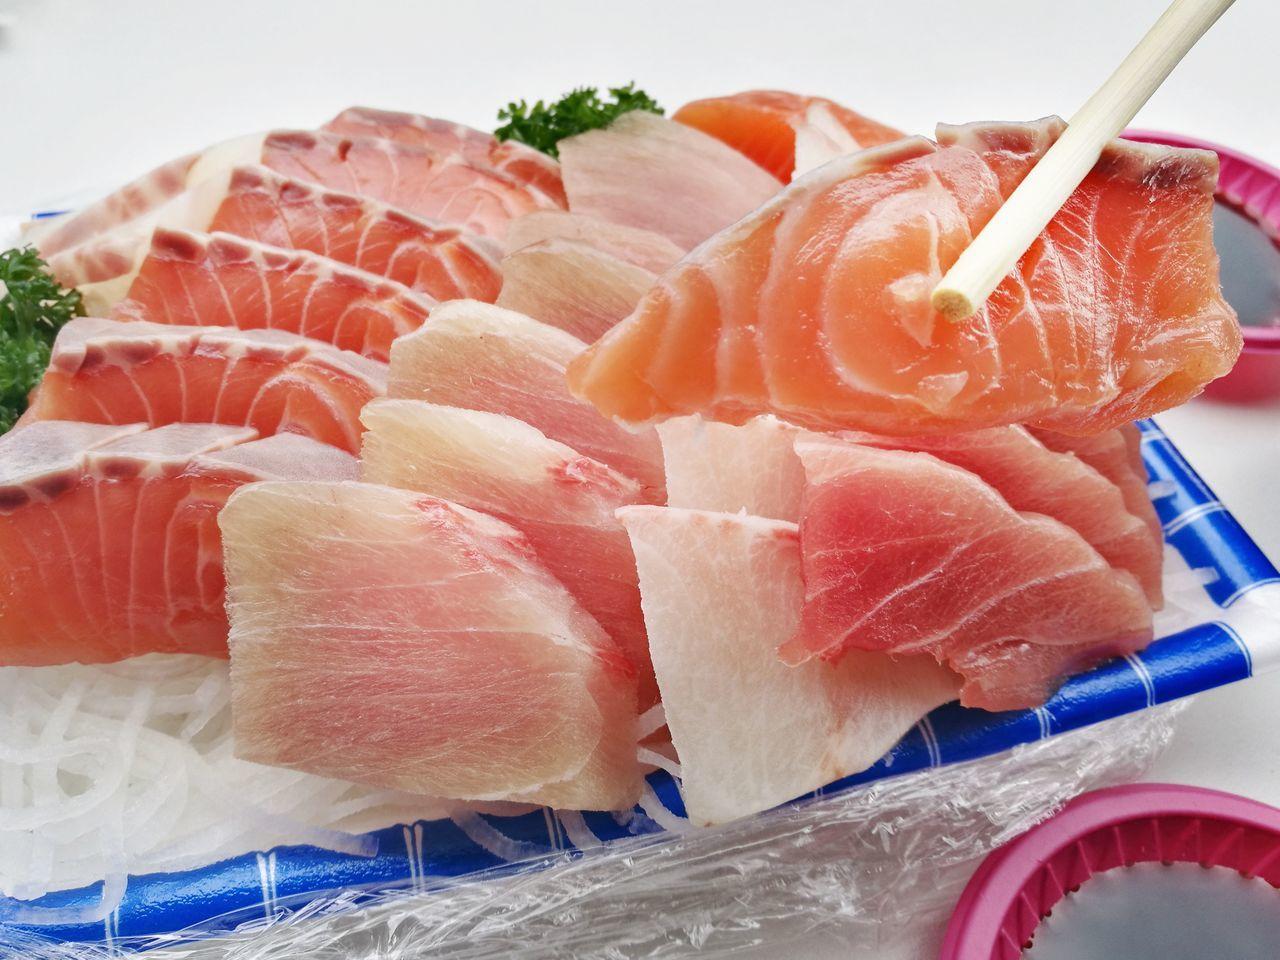 Sashimi Food Raw Food Meat Seafood Freshness Red Food And Drink Market SLICE Healthy Eating Supermarket Fillet No People Japanese Food HuaweiP9 Foodphotography Delicious FreshnessFresh Eat Chopsticks Salmon Sashimi Sasimi Sashimilovers Sashimi Lunch